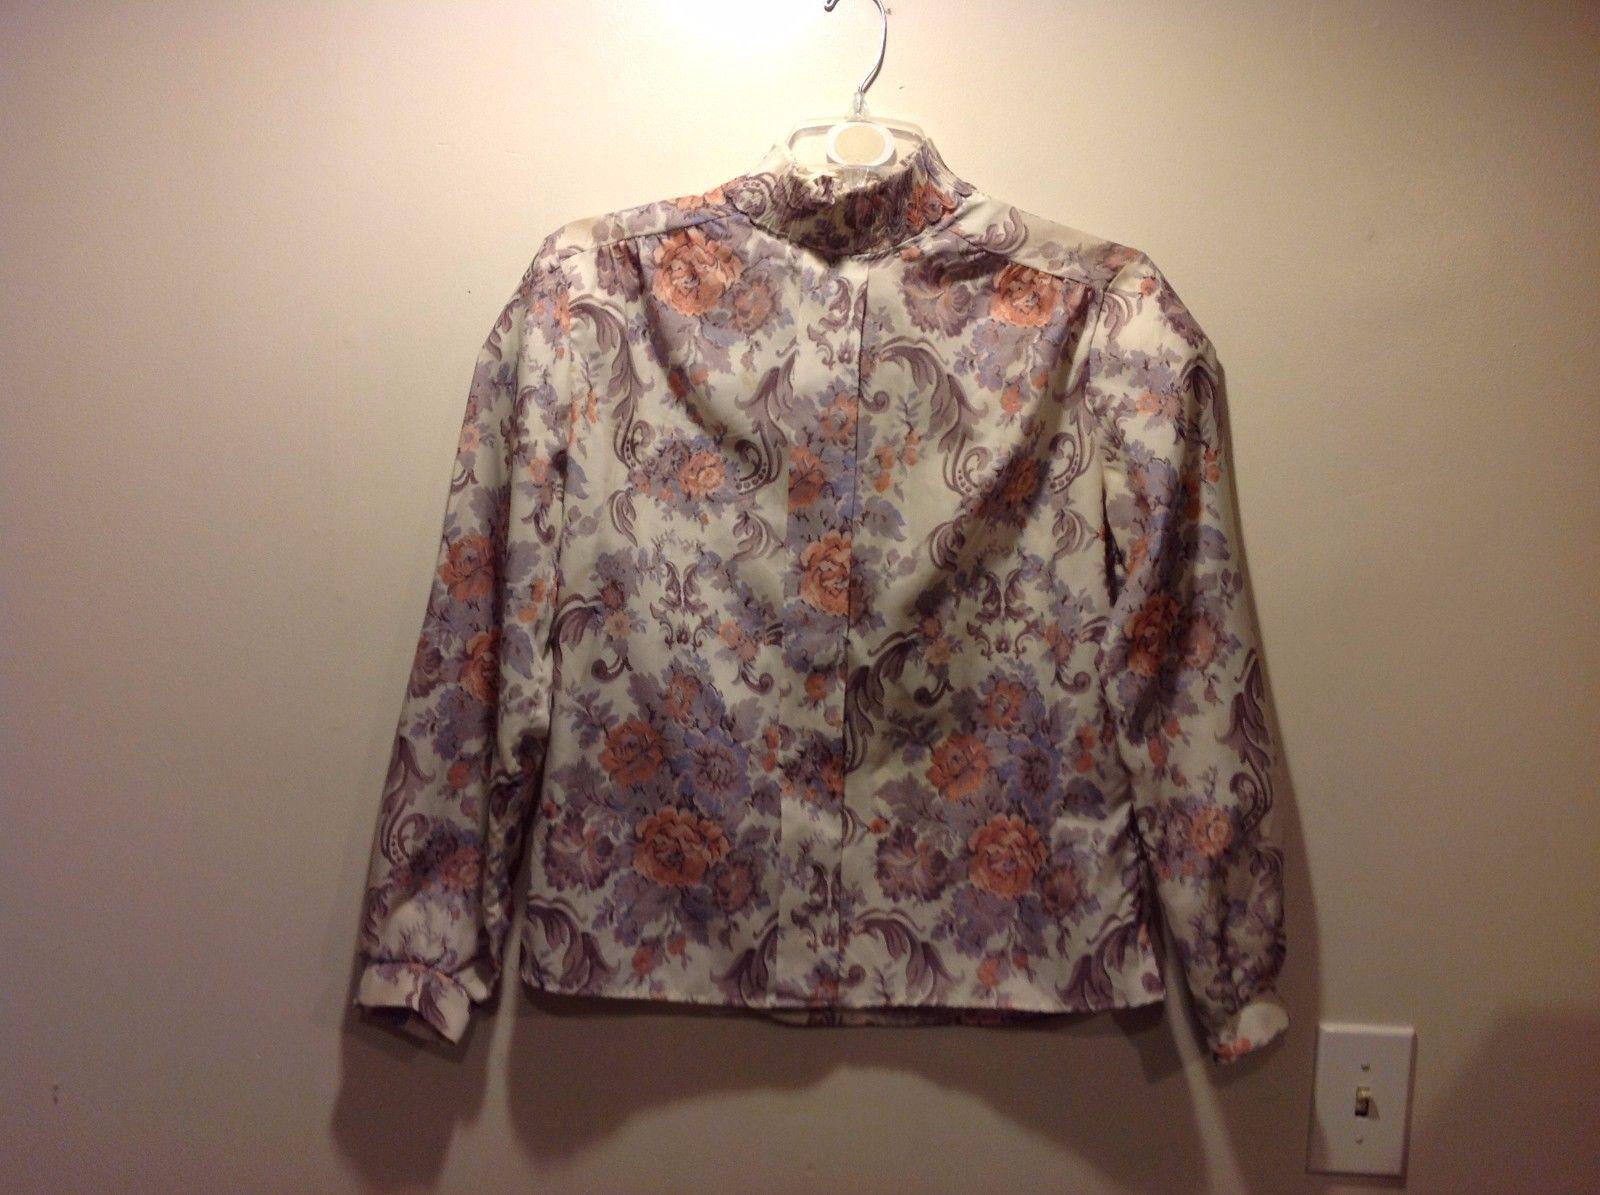 Cape Cod Sportswear Regal Floral Pullover Blouse Sz 16